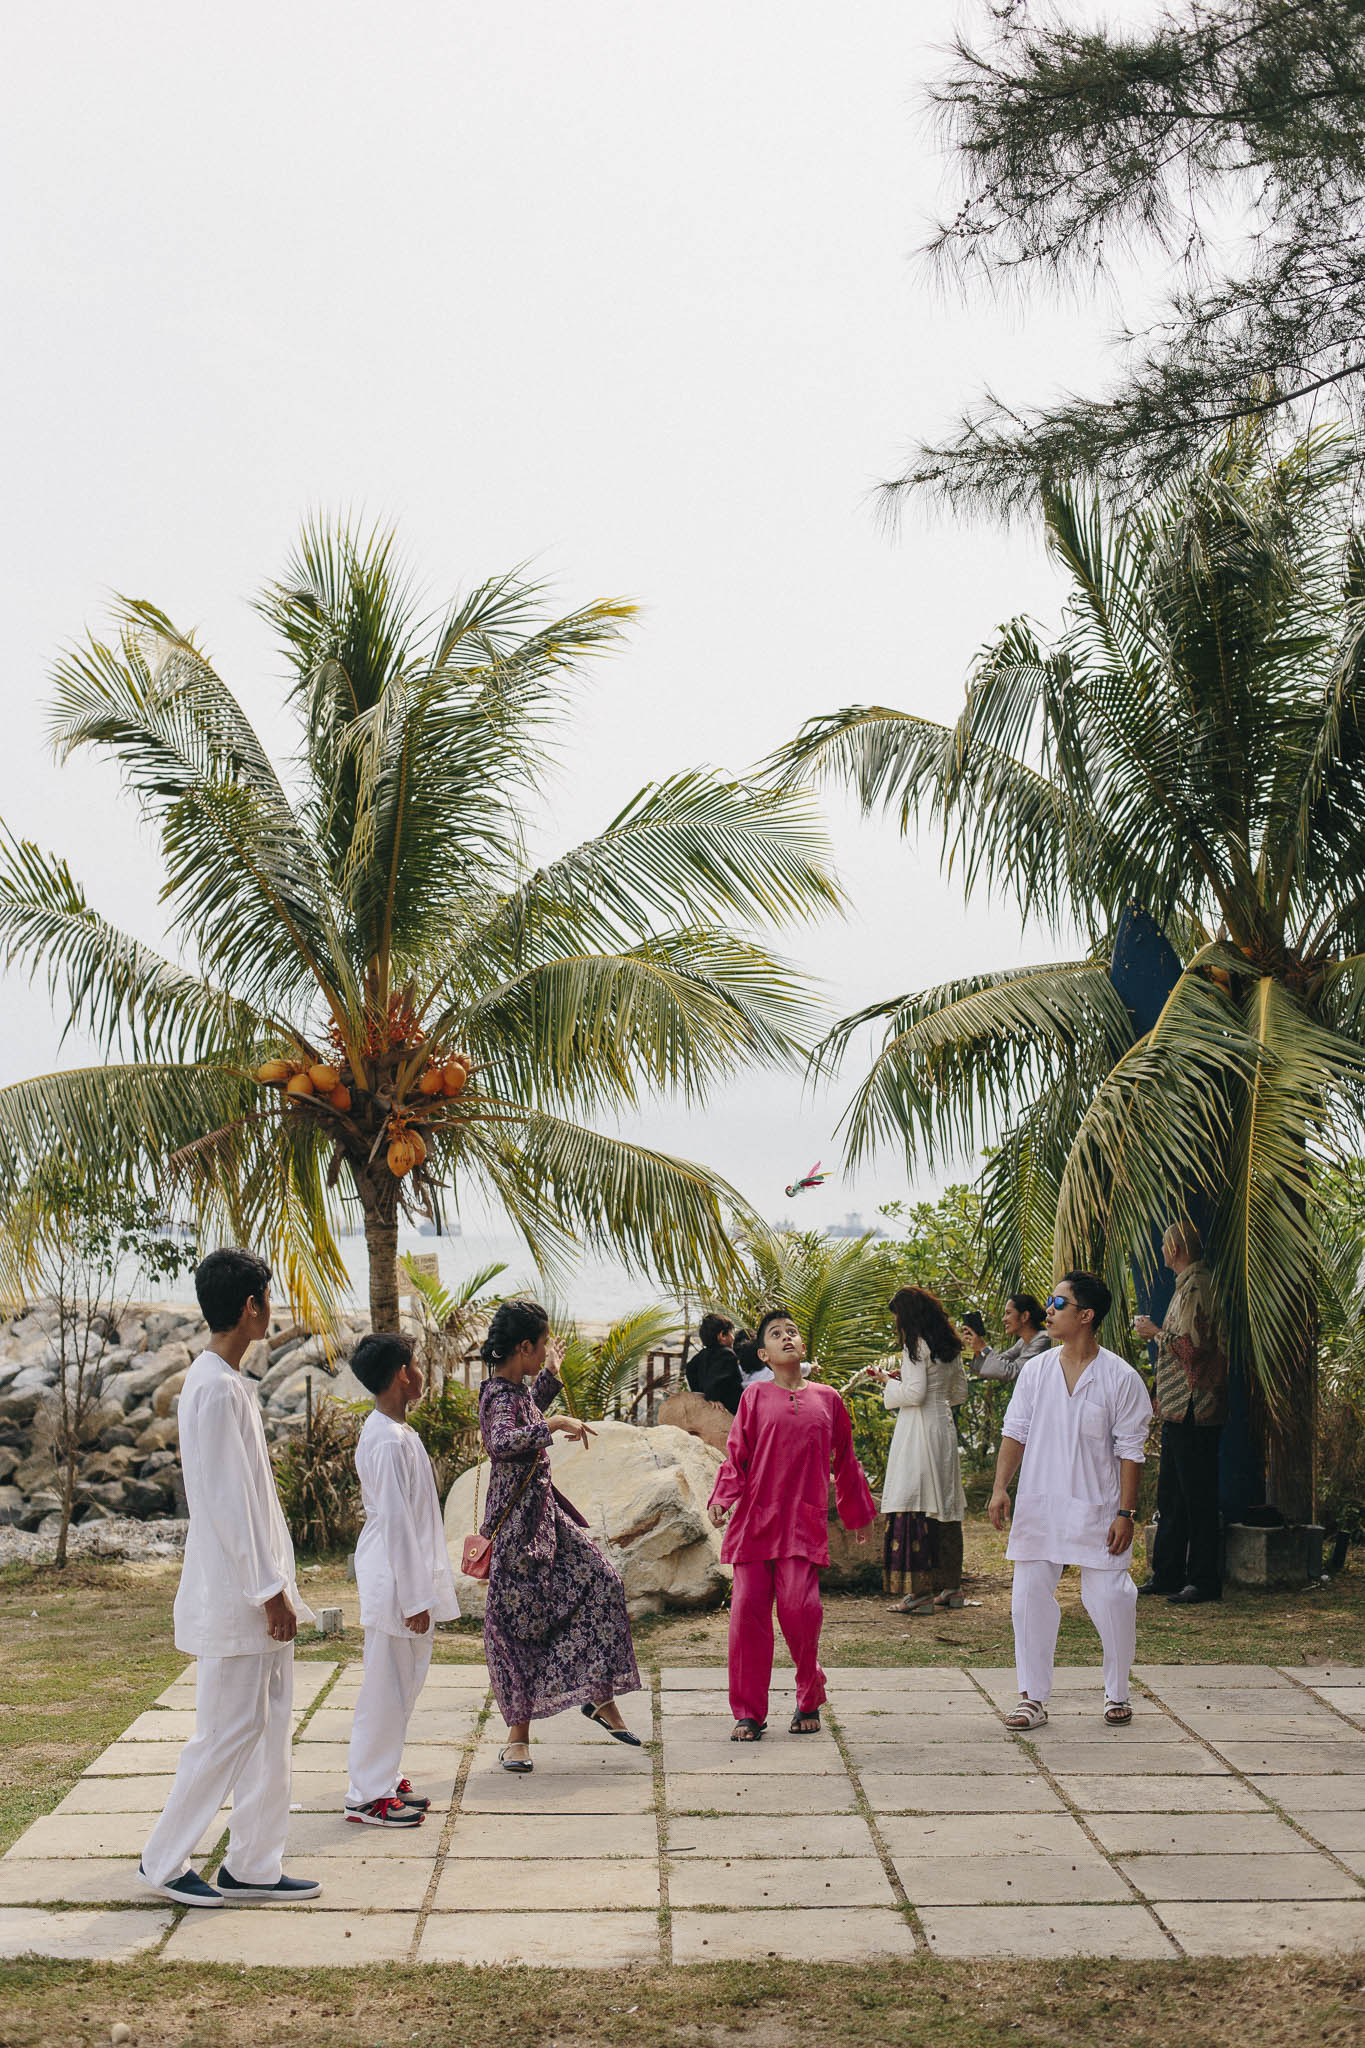 singapore-wedding-photographer-malay-indian-pre-wedding-travel-wmt-2015-54.jpg